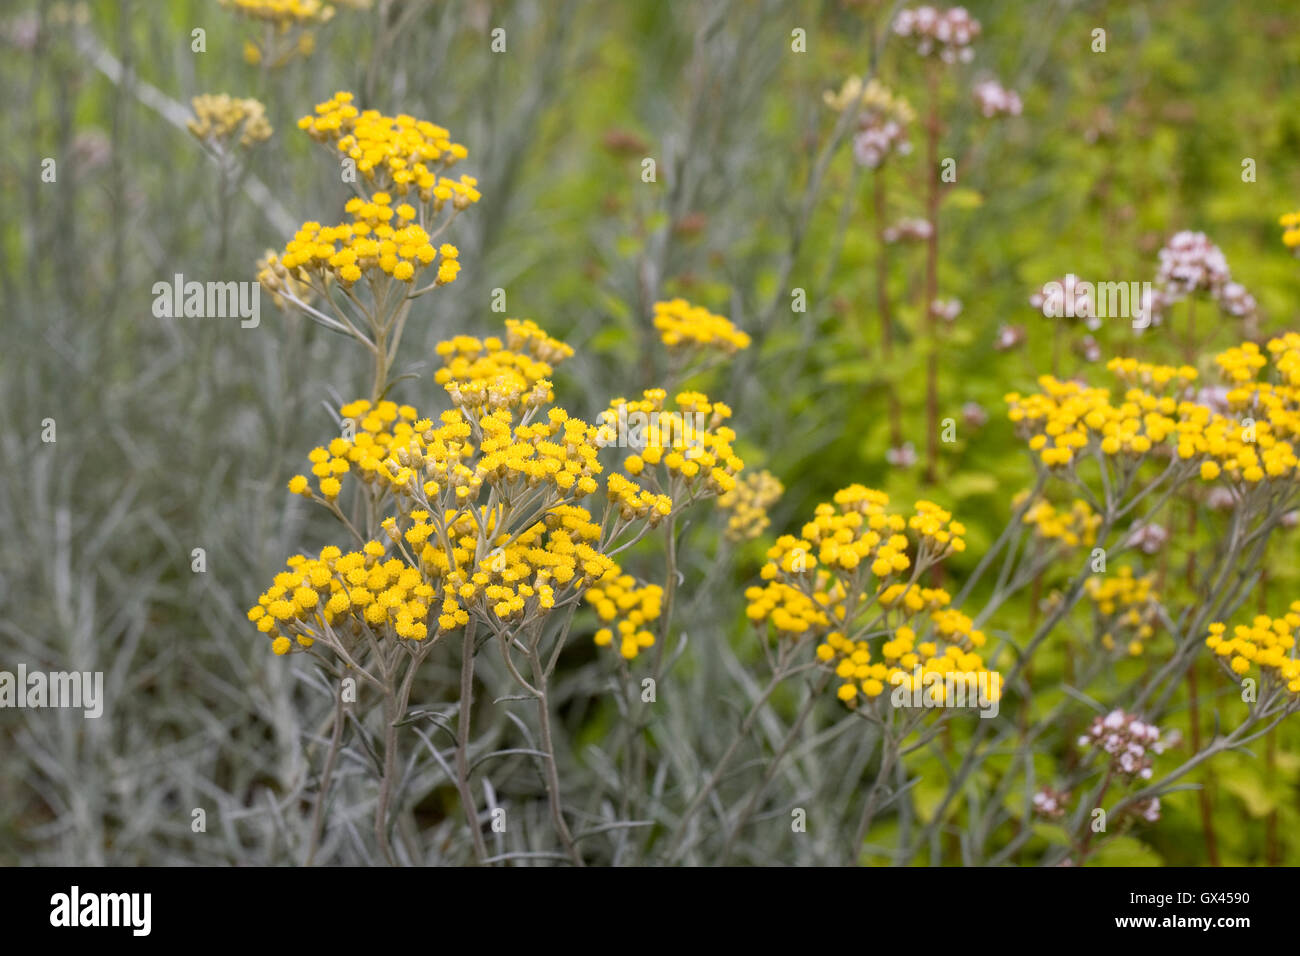 Helichrysum italicum flowers. - Stock Image